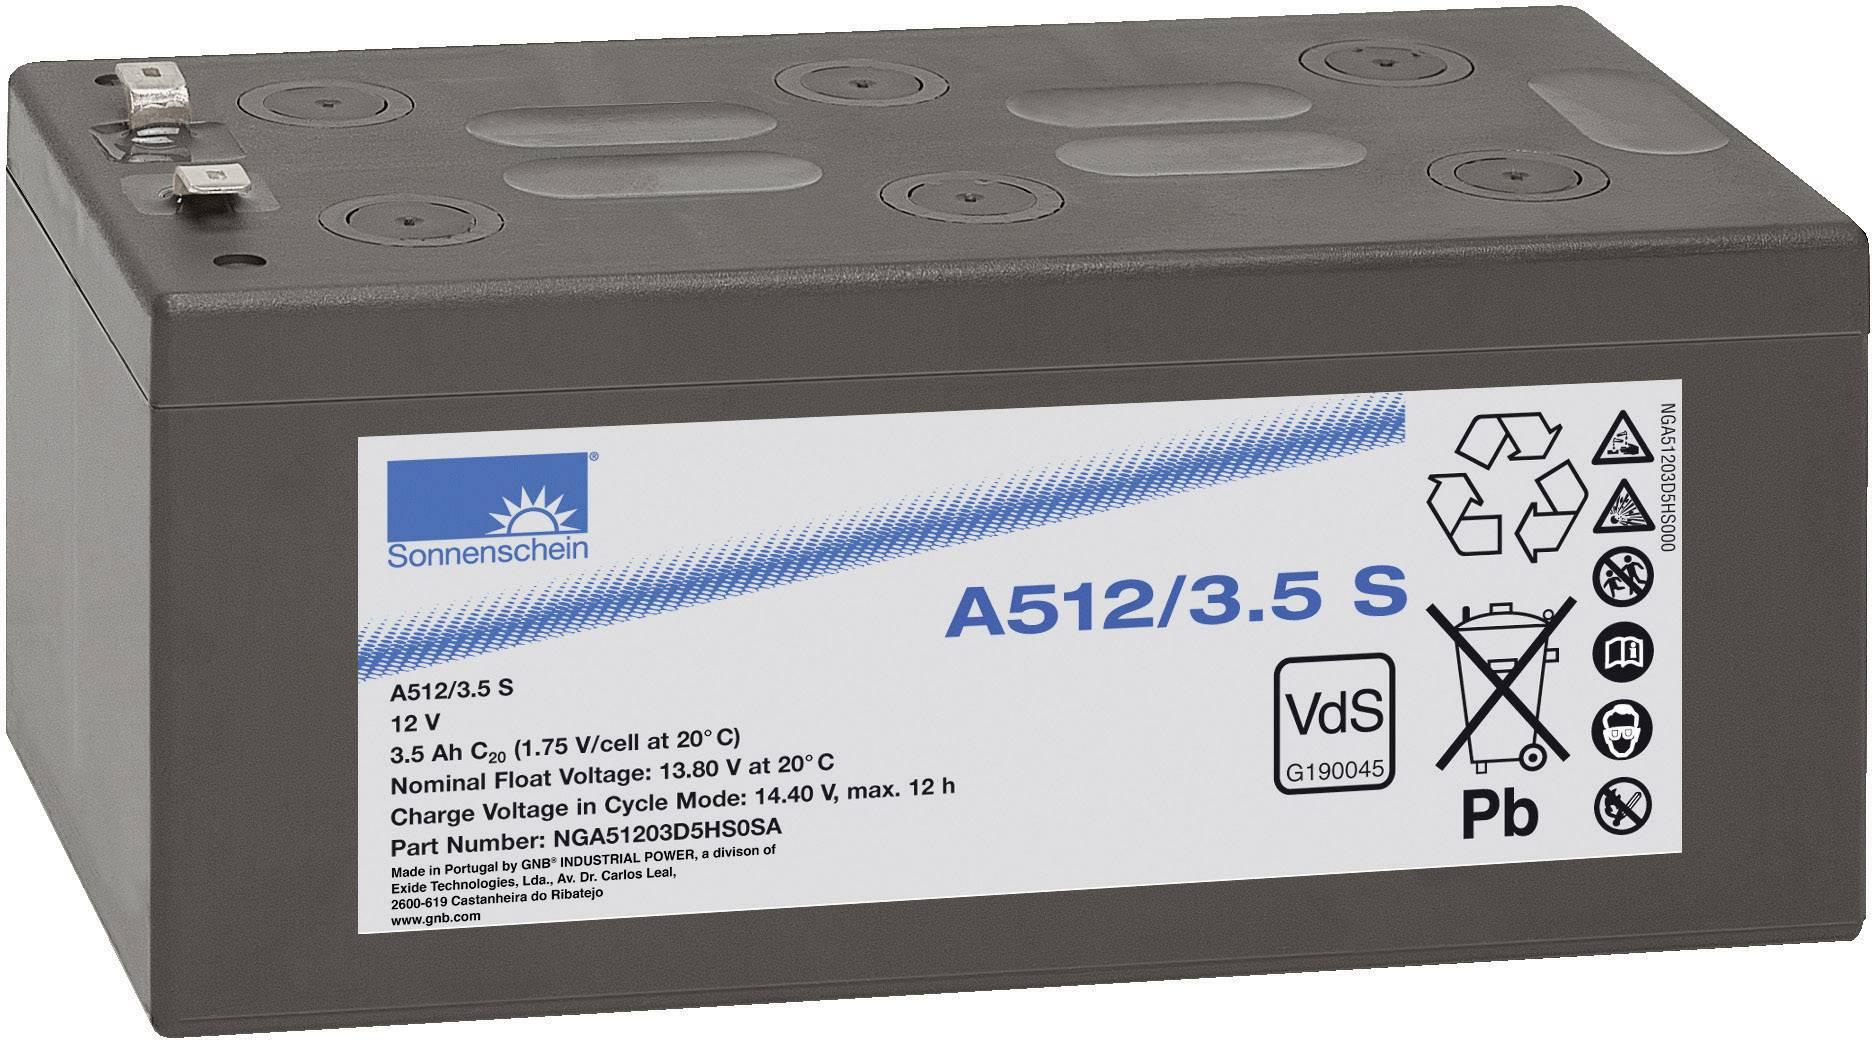 Olovený akumulátor GNB Sonnenschein A512/3,5 S NGA51203D5HS0SA, 3.5 Ah, 12 V